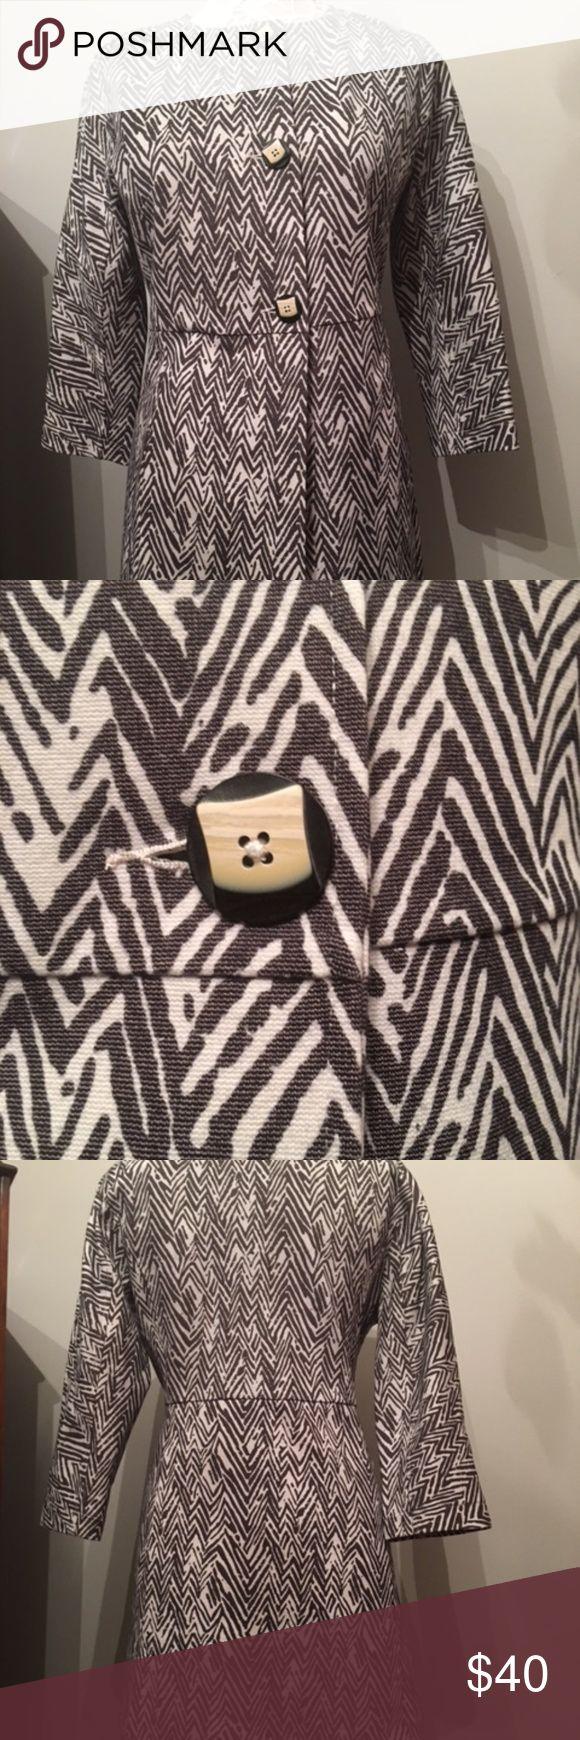 Cabi Zig Zag Jacket Worn once,  geometric print CAbi Jackets & Coats Blazers